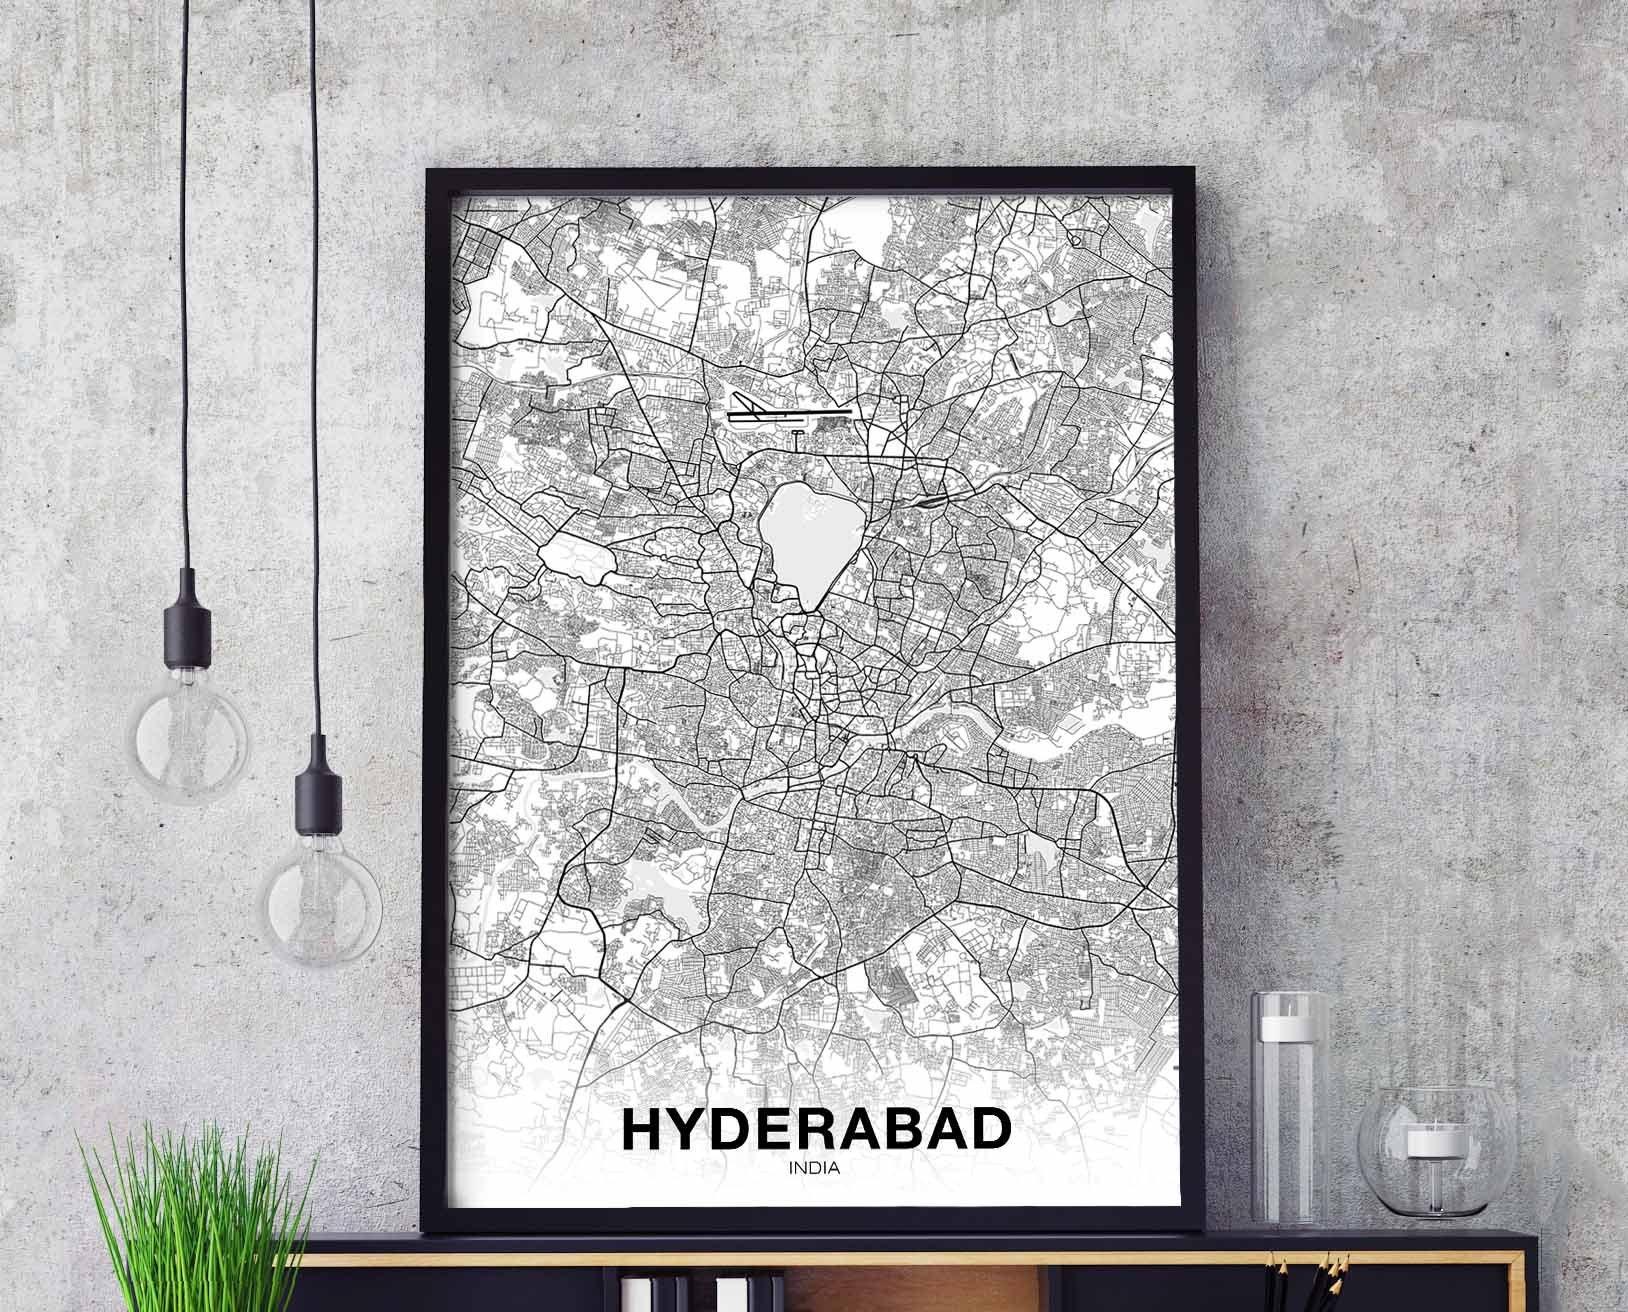 Hyderabad India Map Poster Black White Wall Decor Design